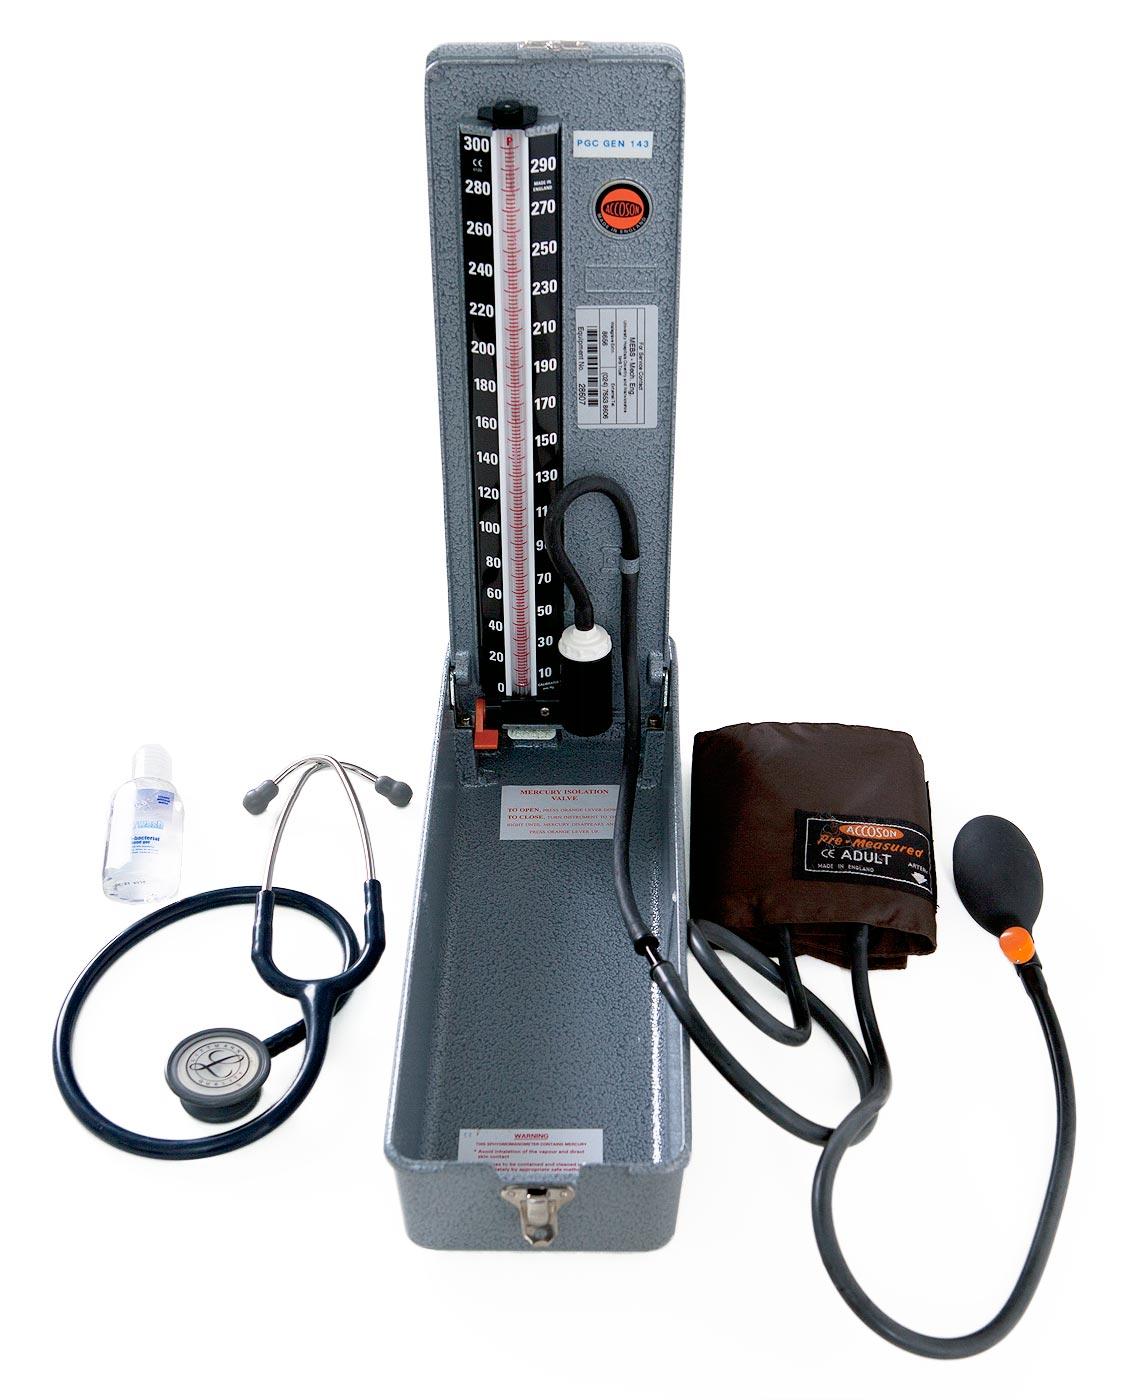 Equipment for measuring blood pressure